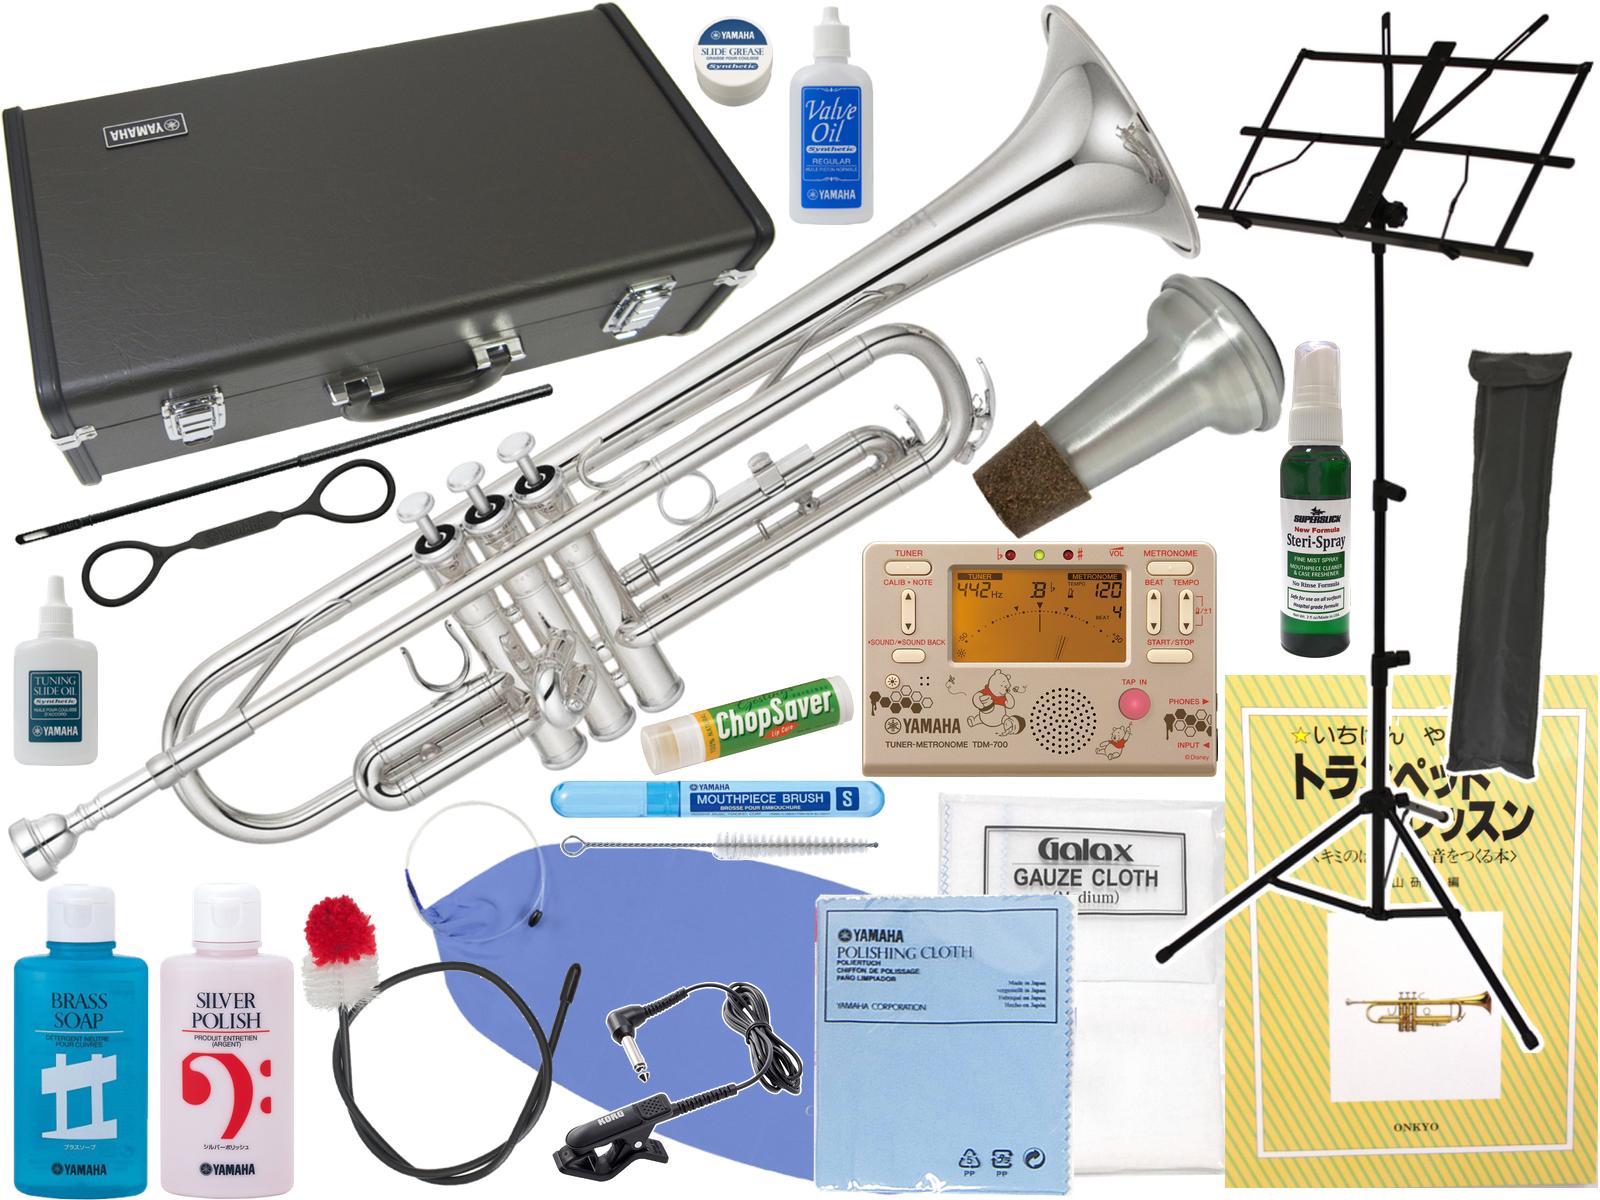 YAMAHA ( ヤマハ ) YTR-2330S トランペット 正規品 銀メッキ シルバー 本体 Bb 管楽器 Trumpet YTR-2330S-01 セット D 北海道 沖縄 離島不可